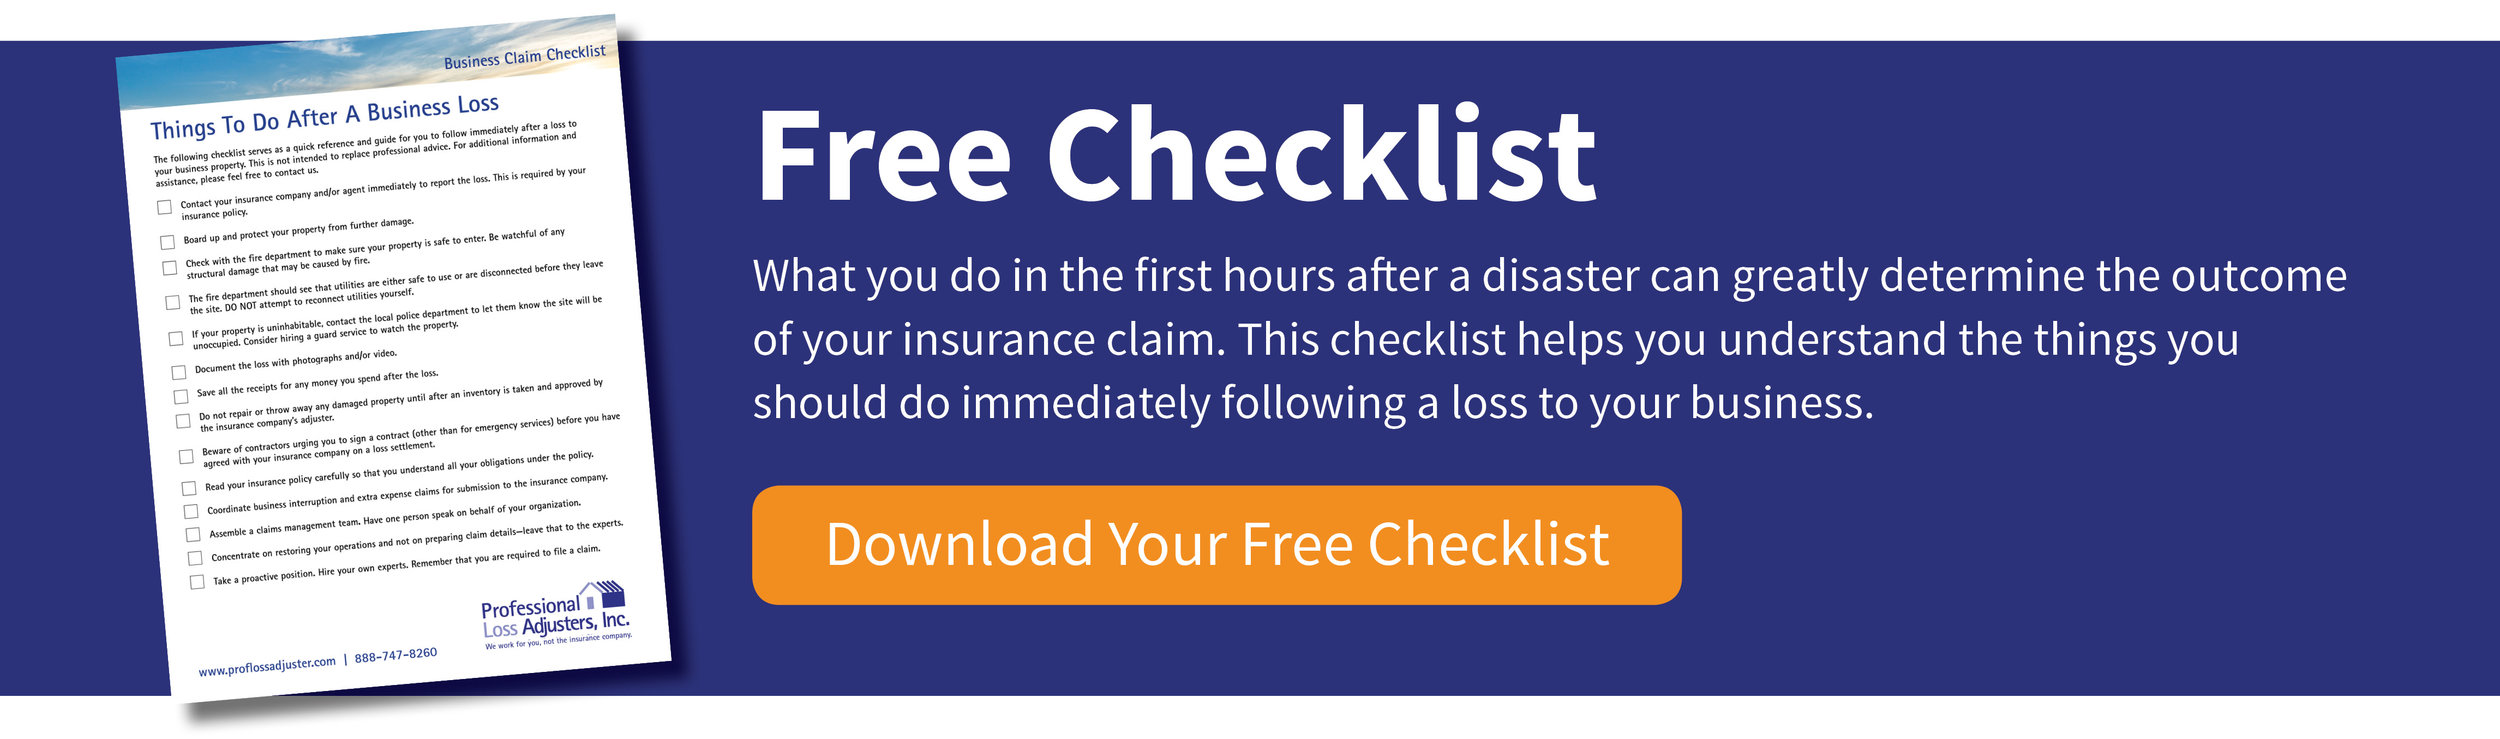 Business Claim Checklist | Professional Loss Adjusters